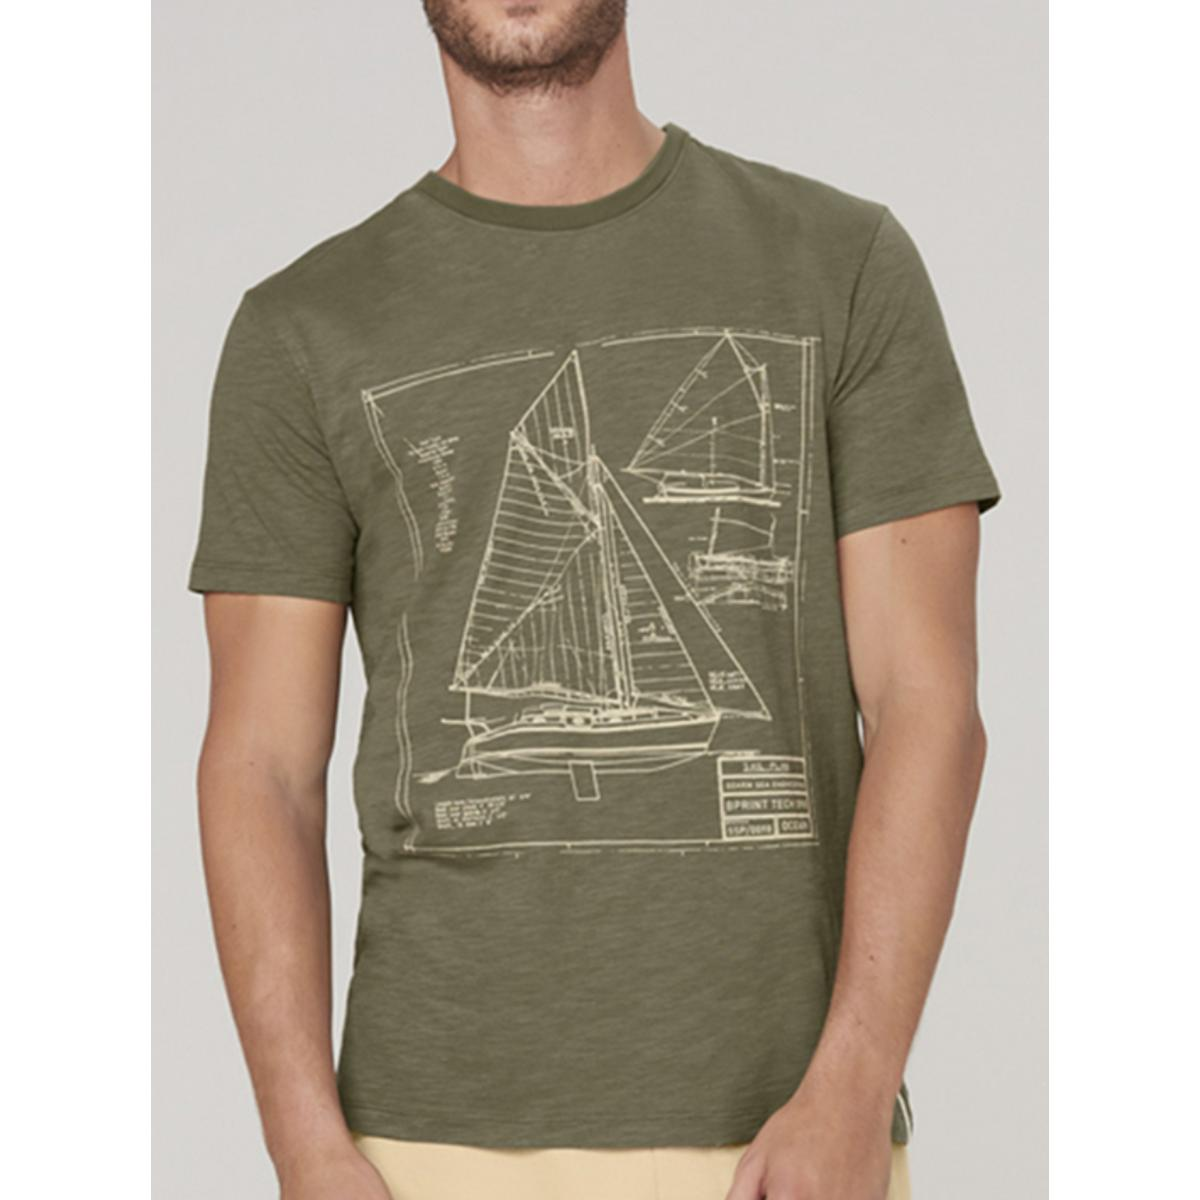 Camiseta Masculina Dzarm 6r7m Eacen Verde Militar